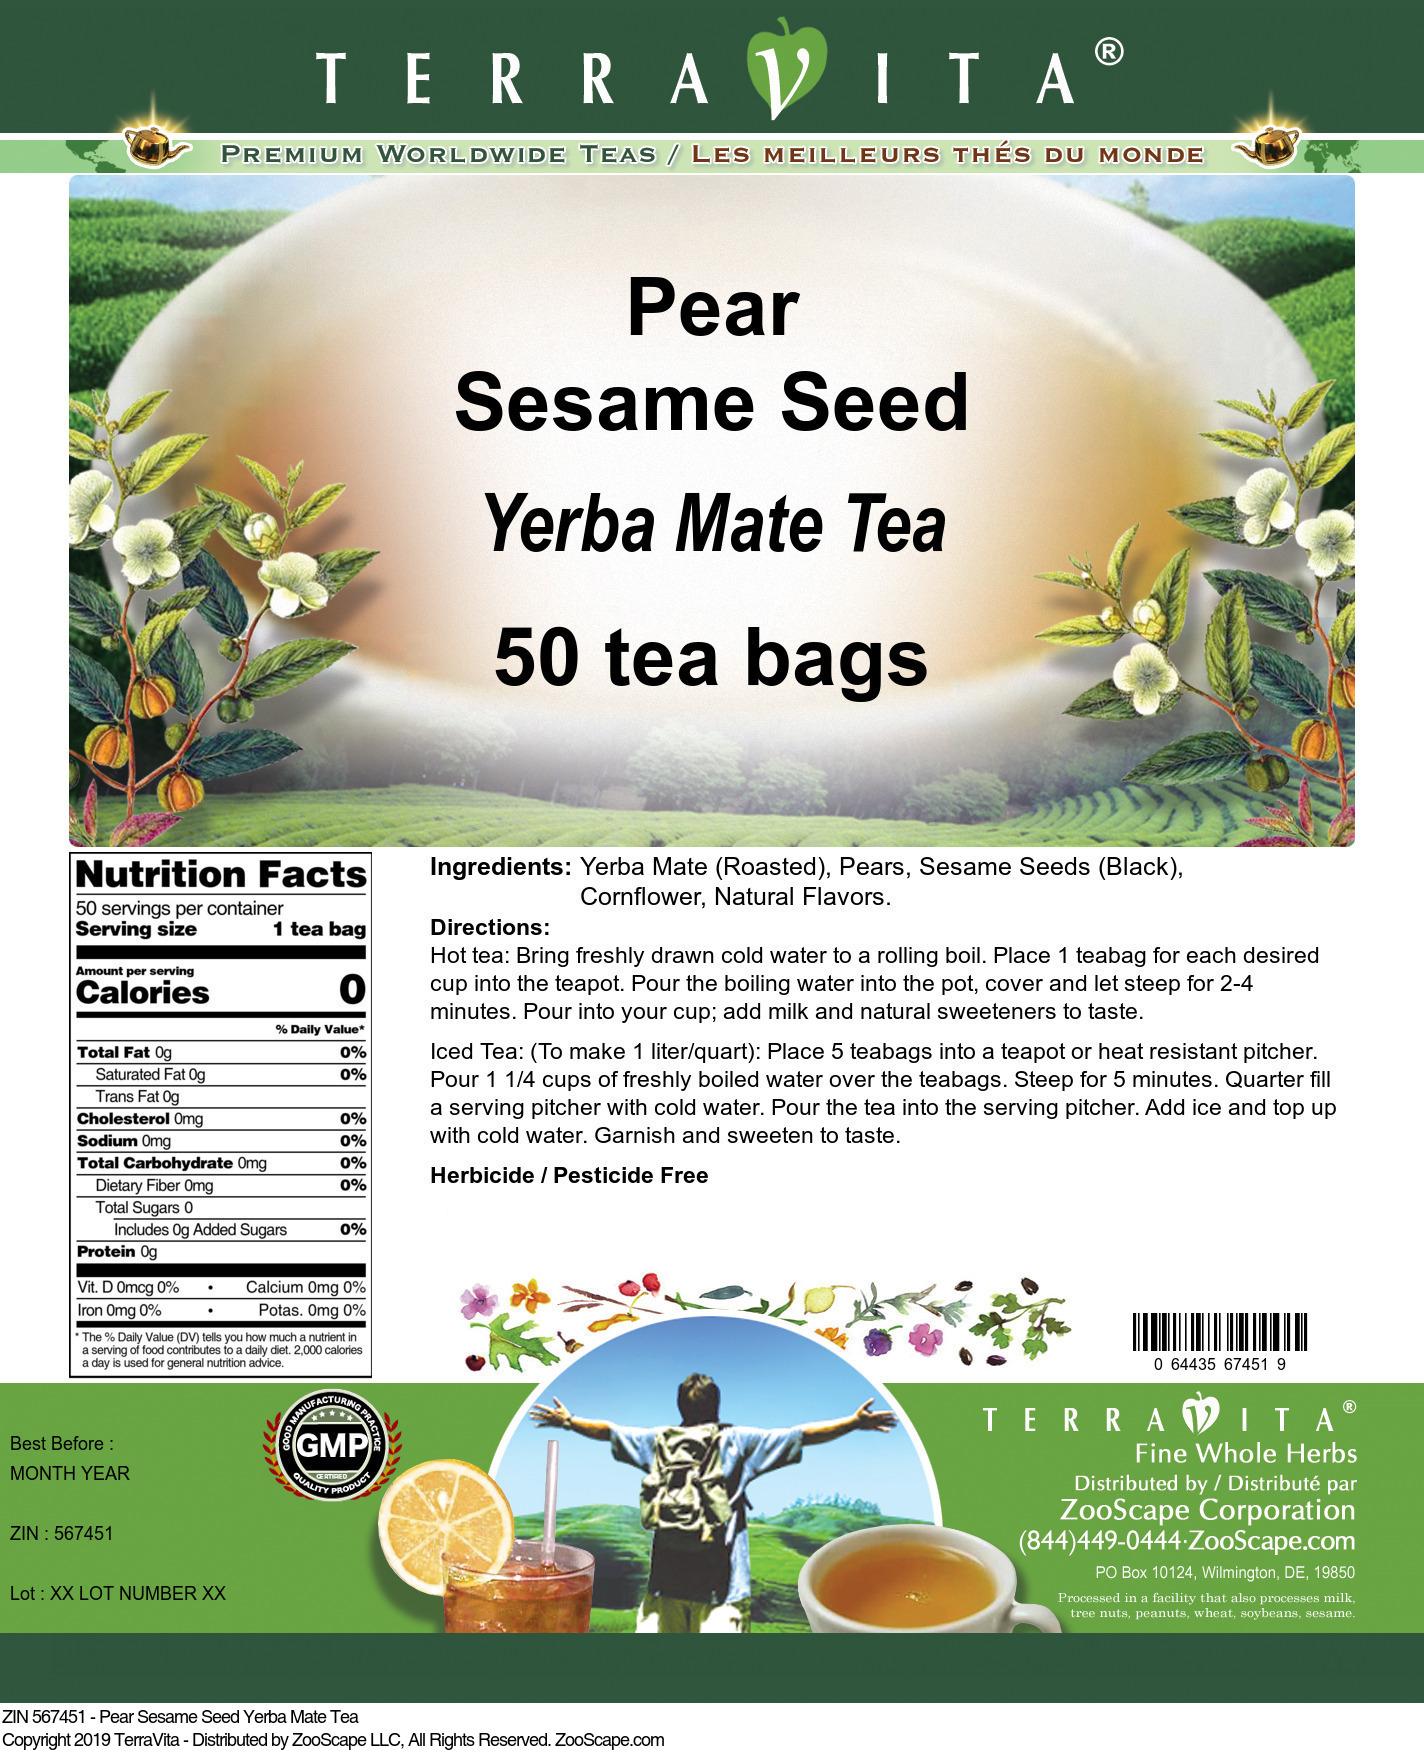 Pear Sesame Seed Yerba Mate Tea